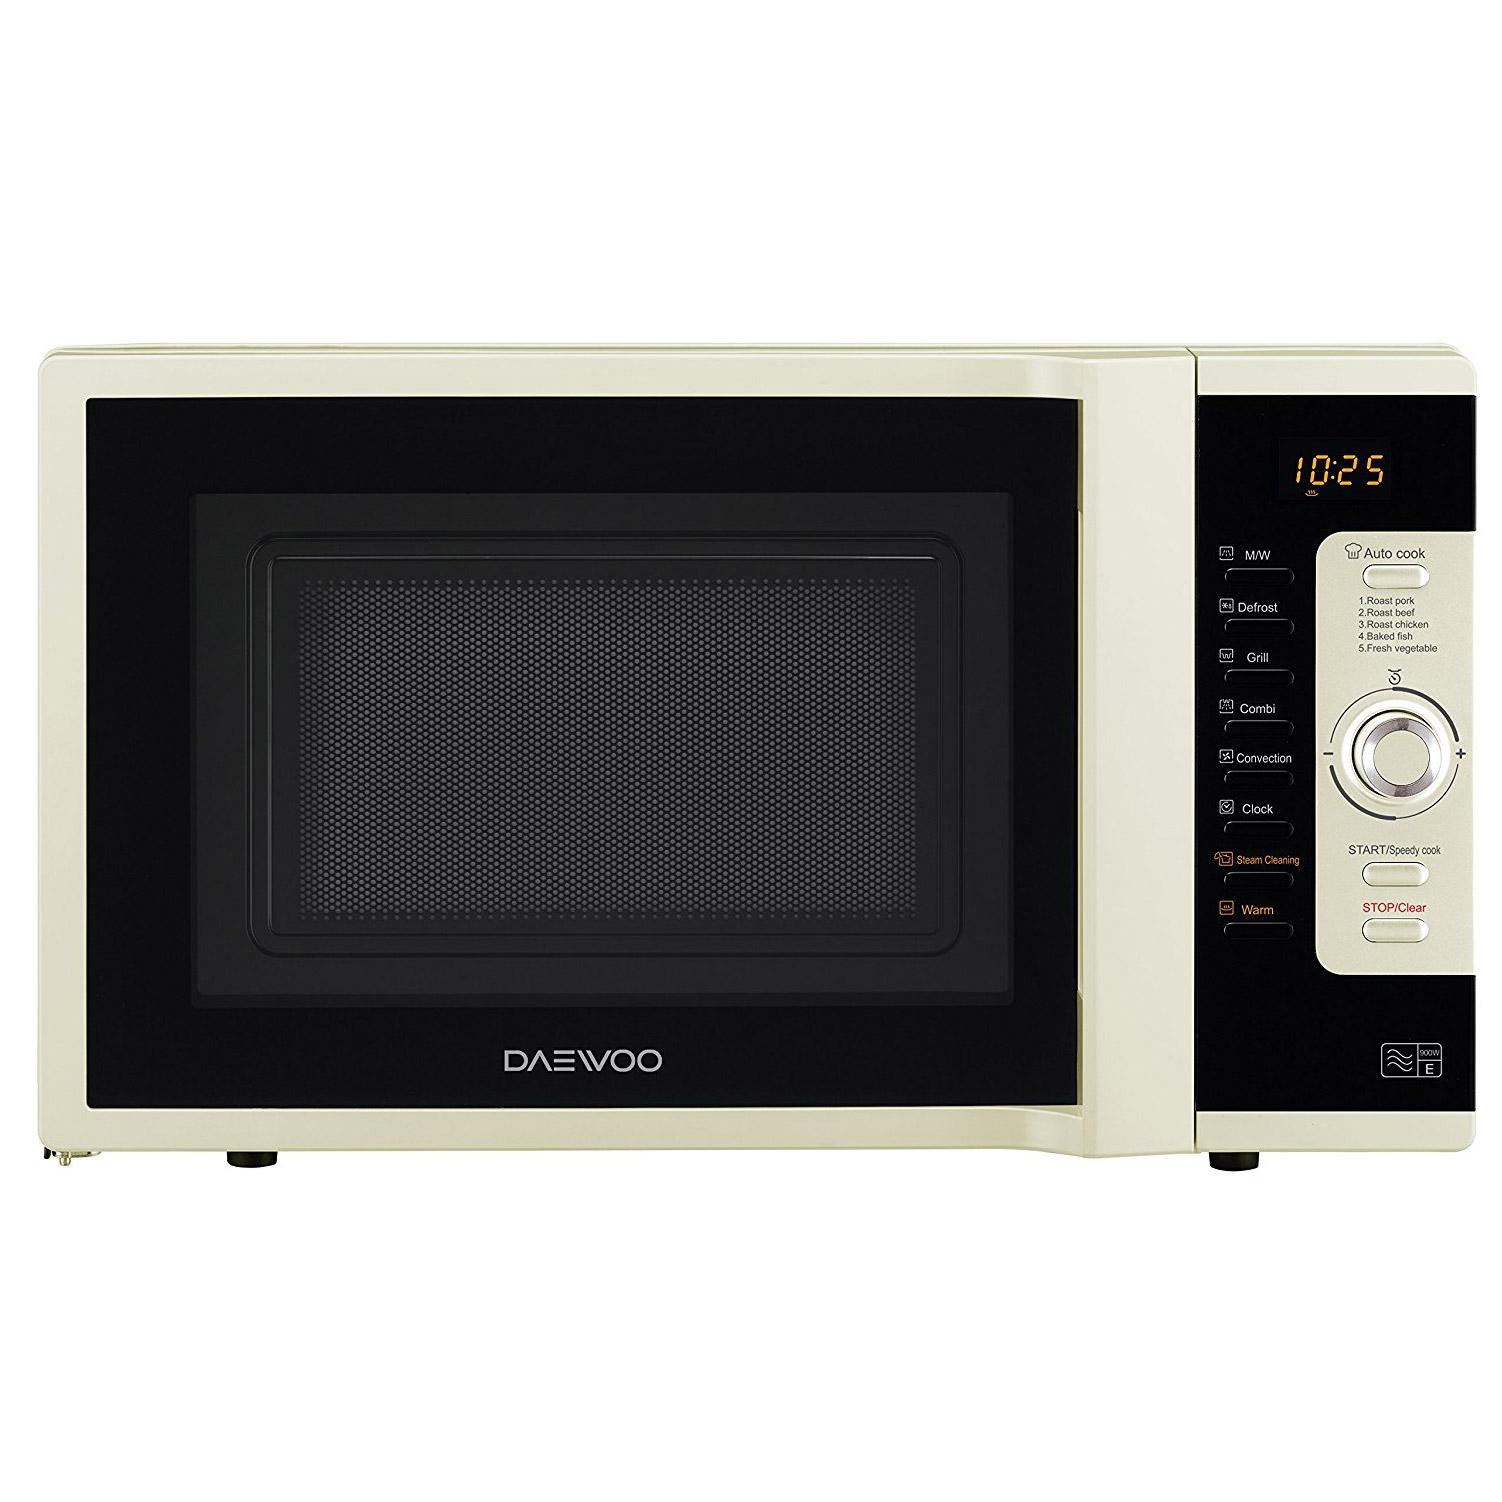 daewoo koc9c0tc combination microwave oven in cream 28l 900w rh sonicdirect co uk daewoo dc microwave oven manual daewoo microwave oven manual